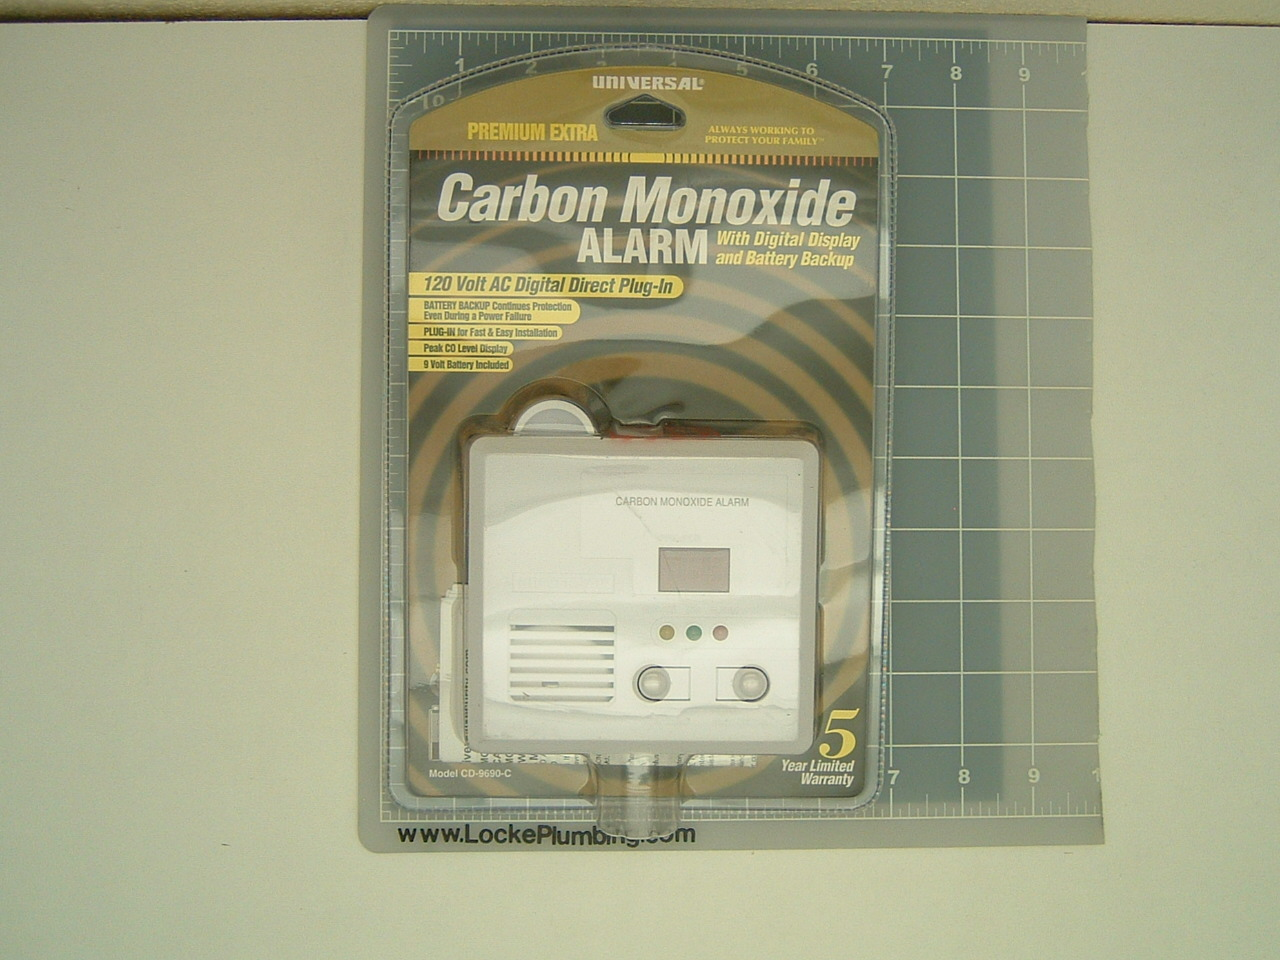 universal premium extra carbon monoxide alarm 120 vac direct plug in locke plumbing. Black Bedroom Furniture Sets. Home Design Ideas